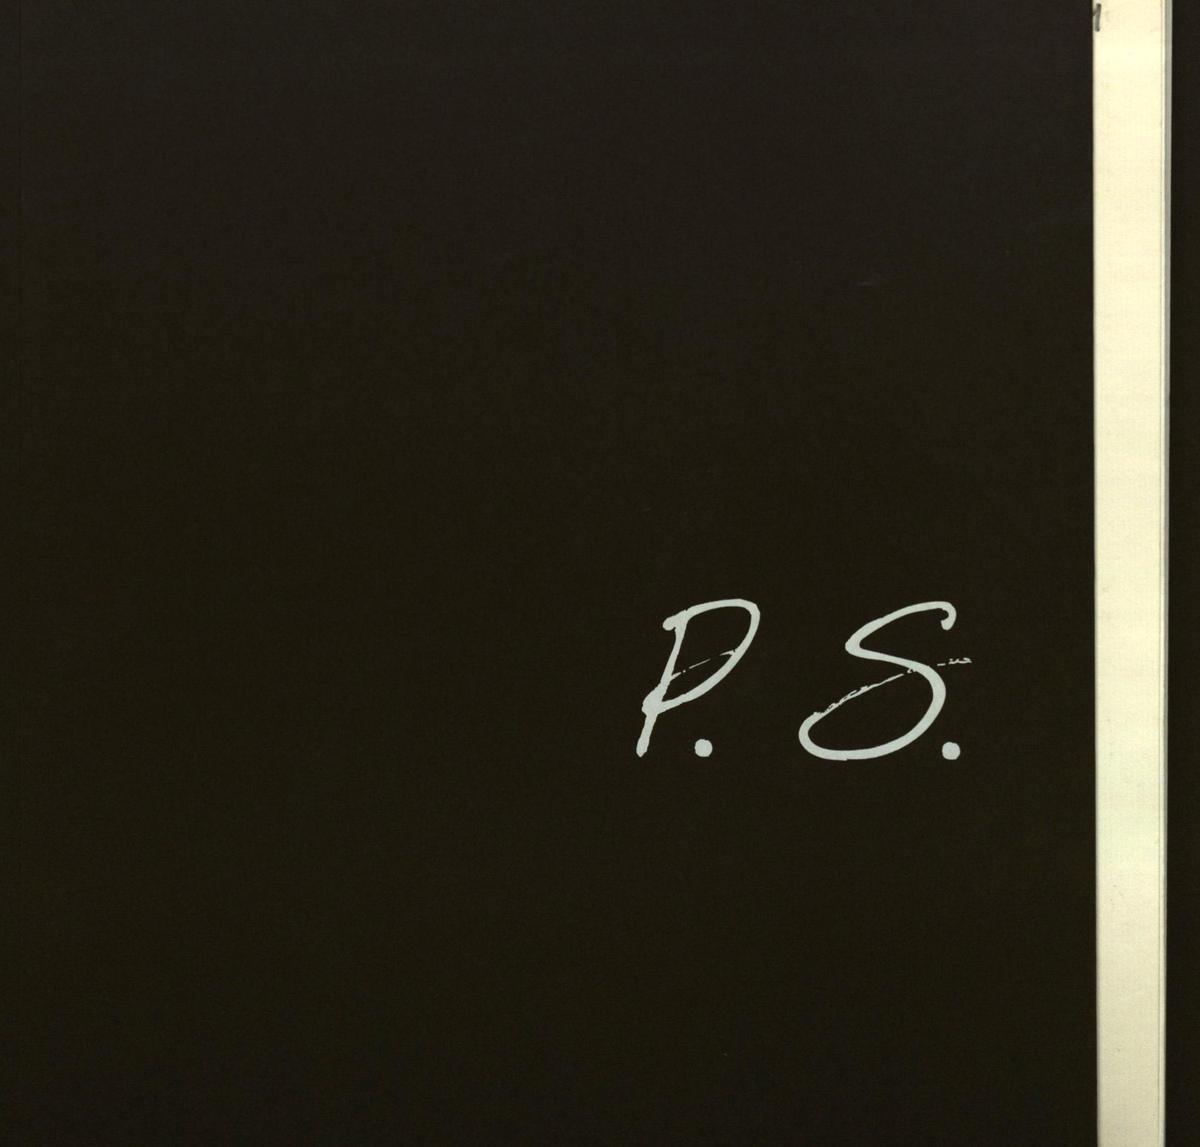 M3-13686.JPG